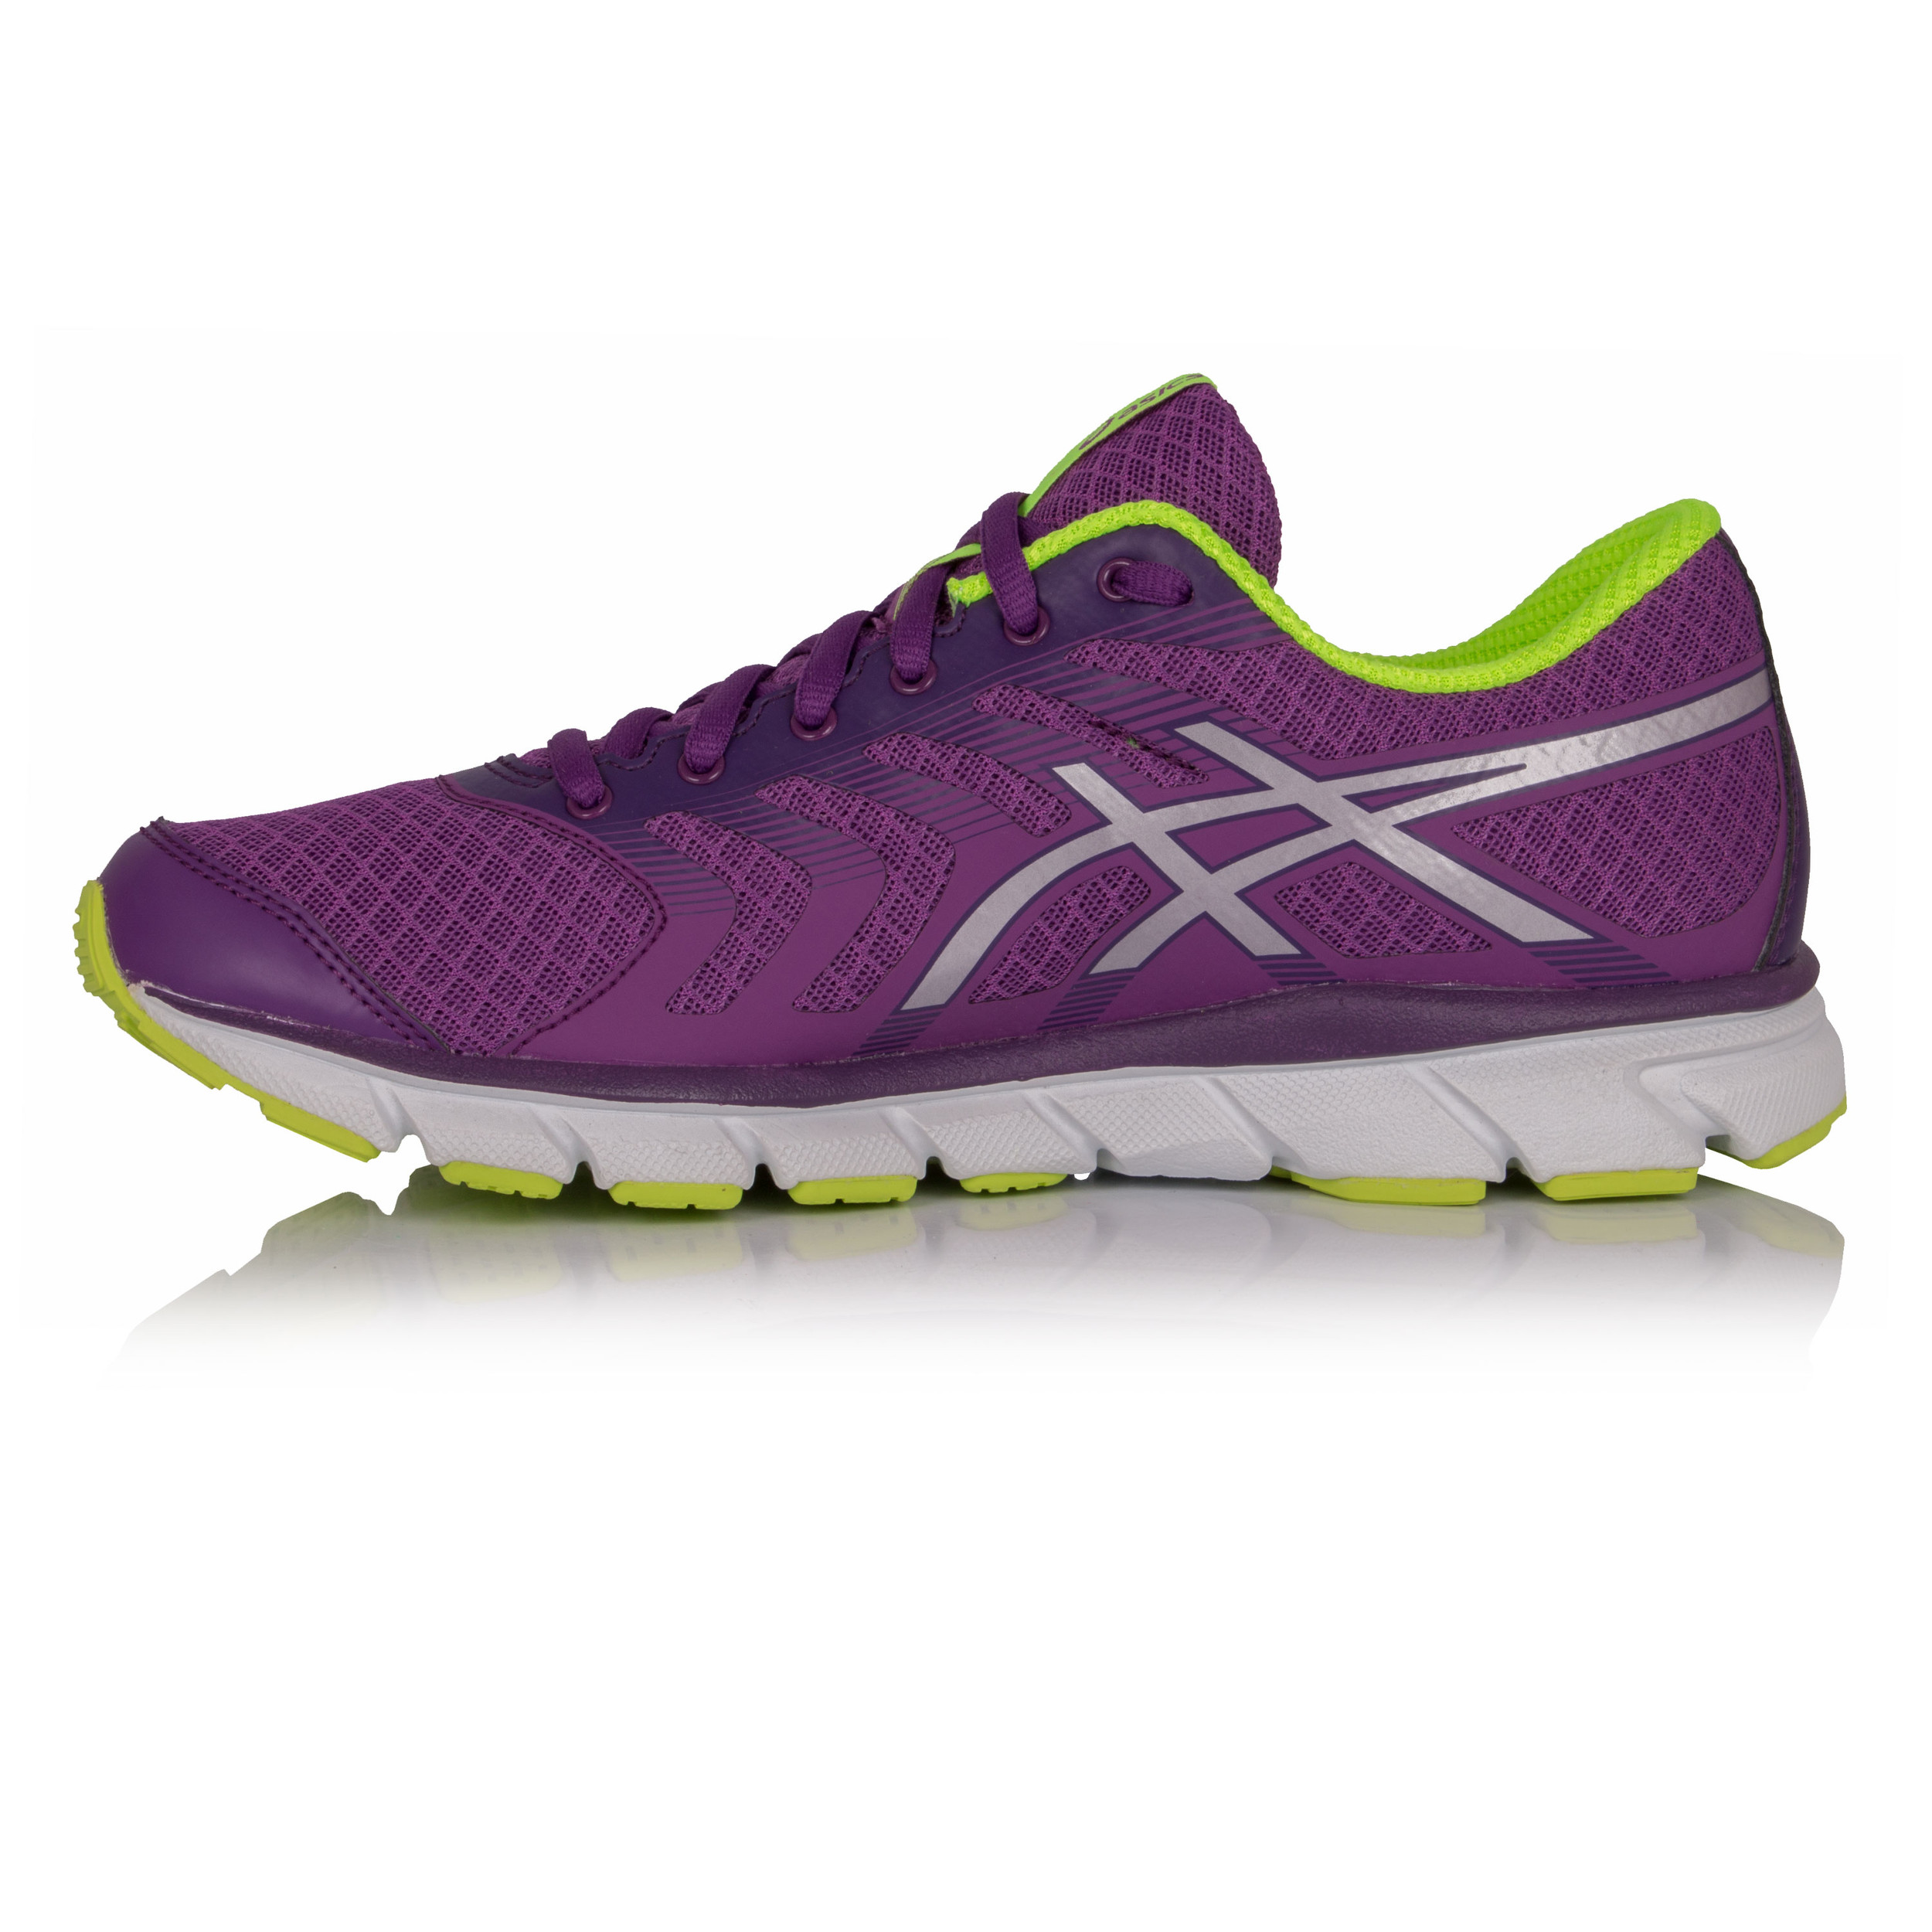 Asics Schuhe Damen Lila Gel-Xalion 3 Laufschuhe Jogging Sport Schuhe Asics Trainingsschuhe Vi 321025